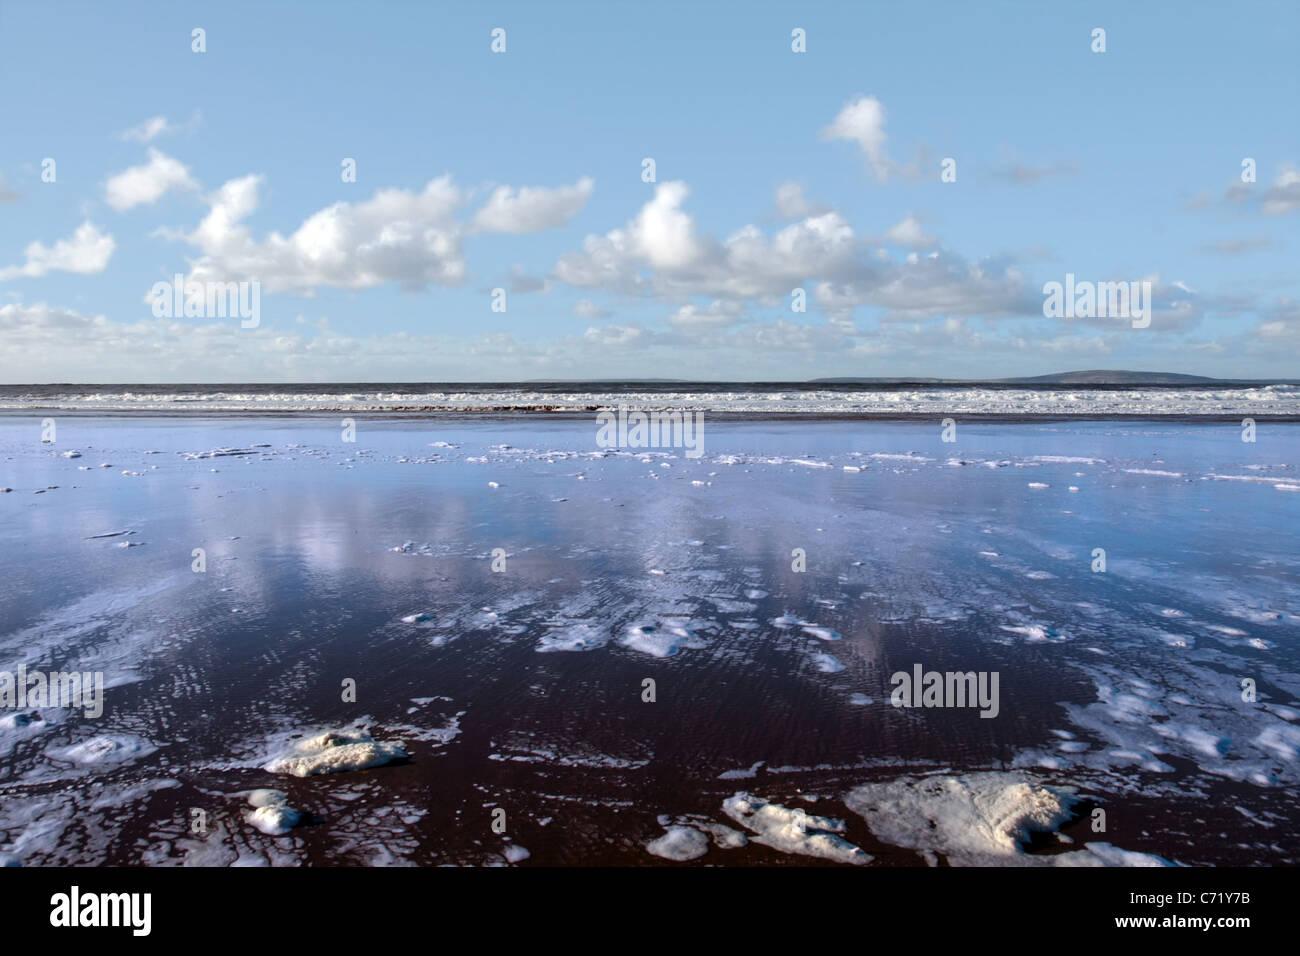 the waves with reflection crashing in on ballybunion beach ireland - Stock Image